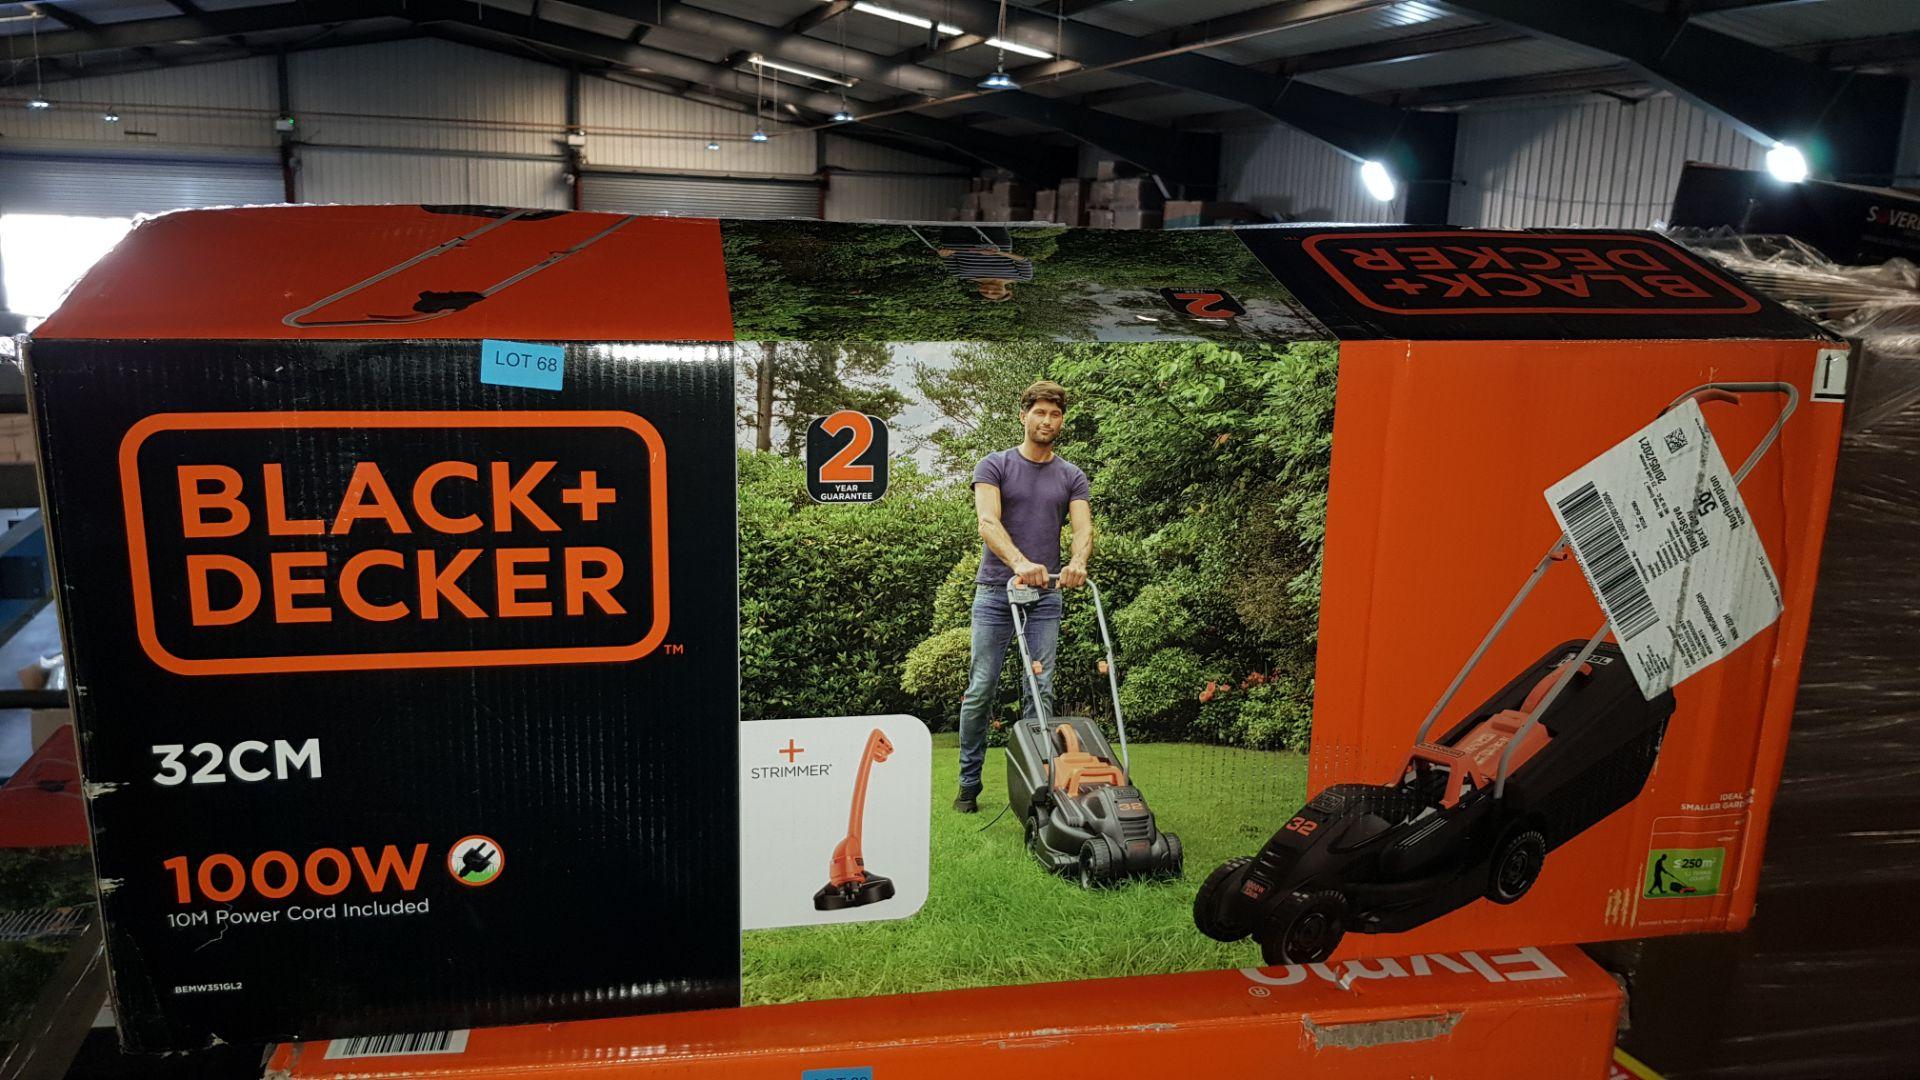 (P5) 1x Black & Decker 32cm 1000W Corded Lawn Mower & Strimmer RRP £99. Contents Appear Clean, Unu - Image 2 of 3